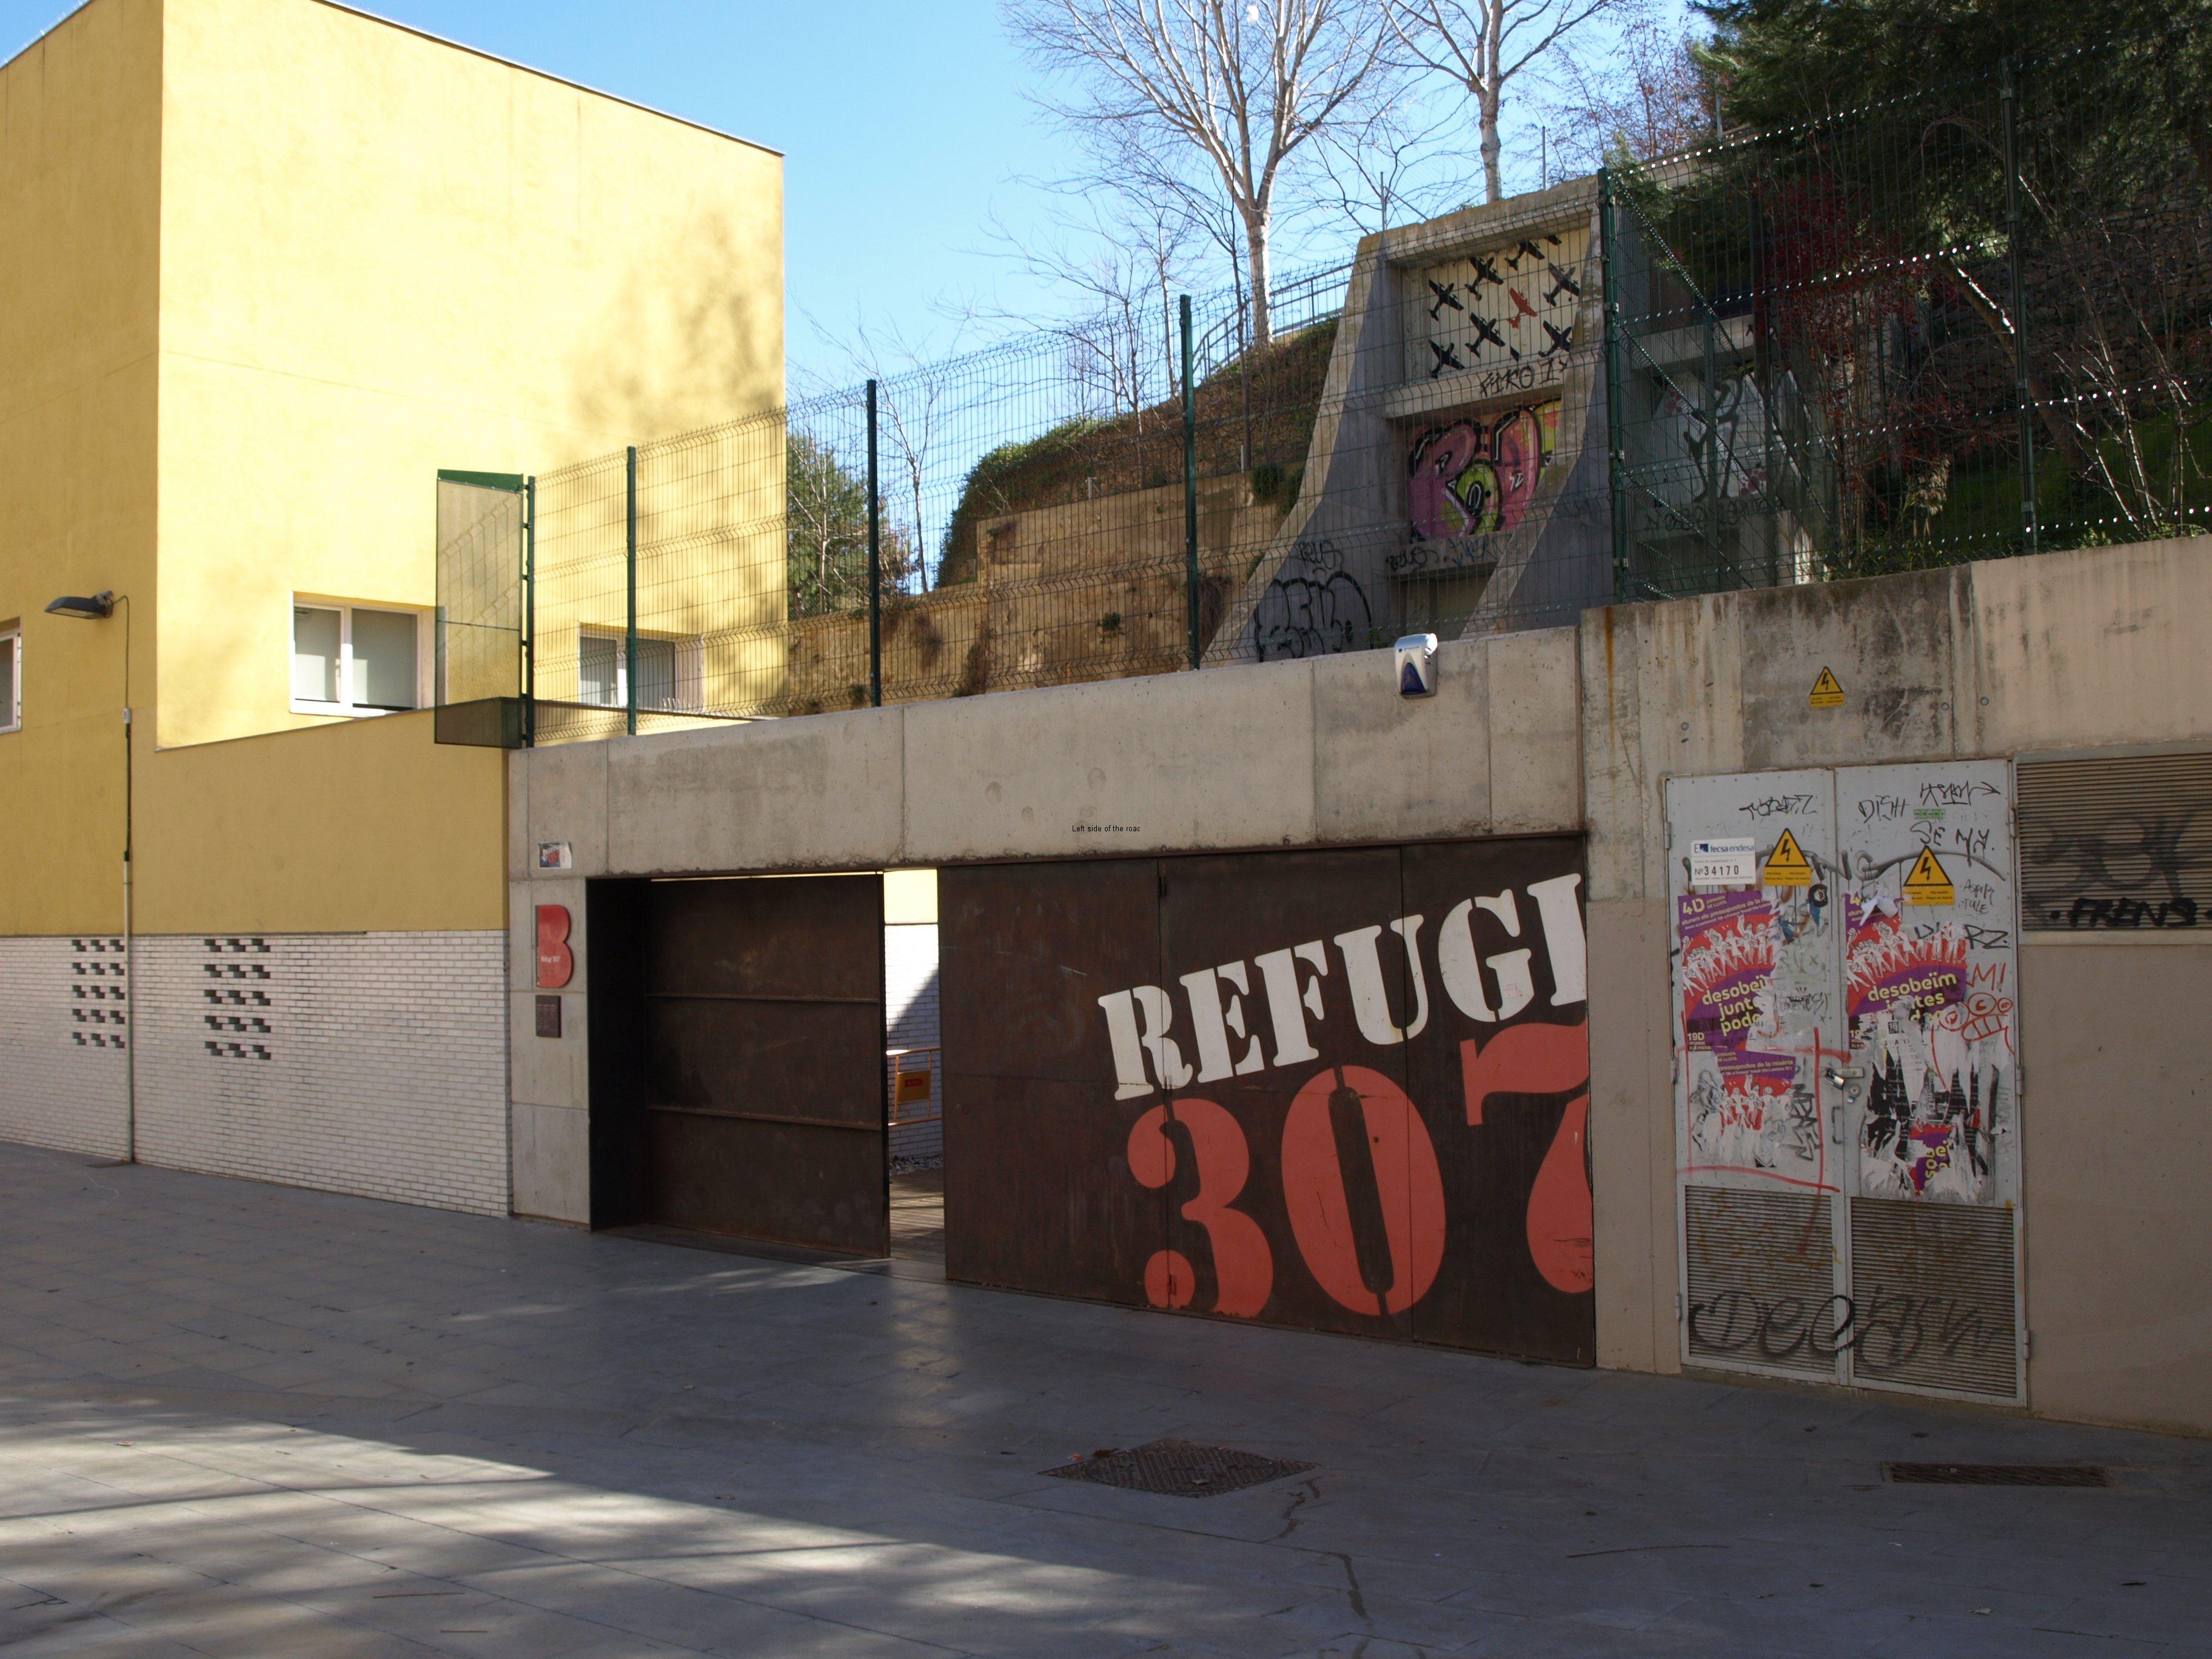 Refugi 307, Poble Sec, Barcelona